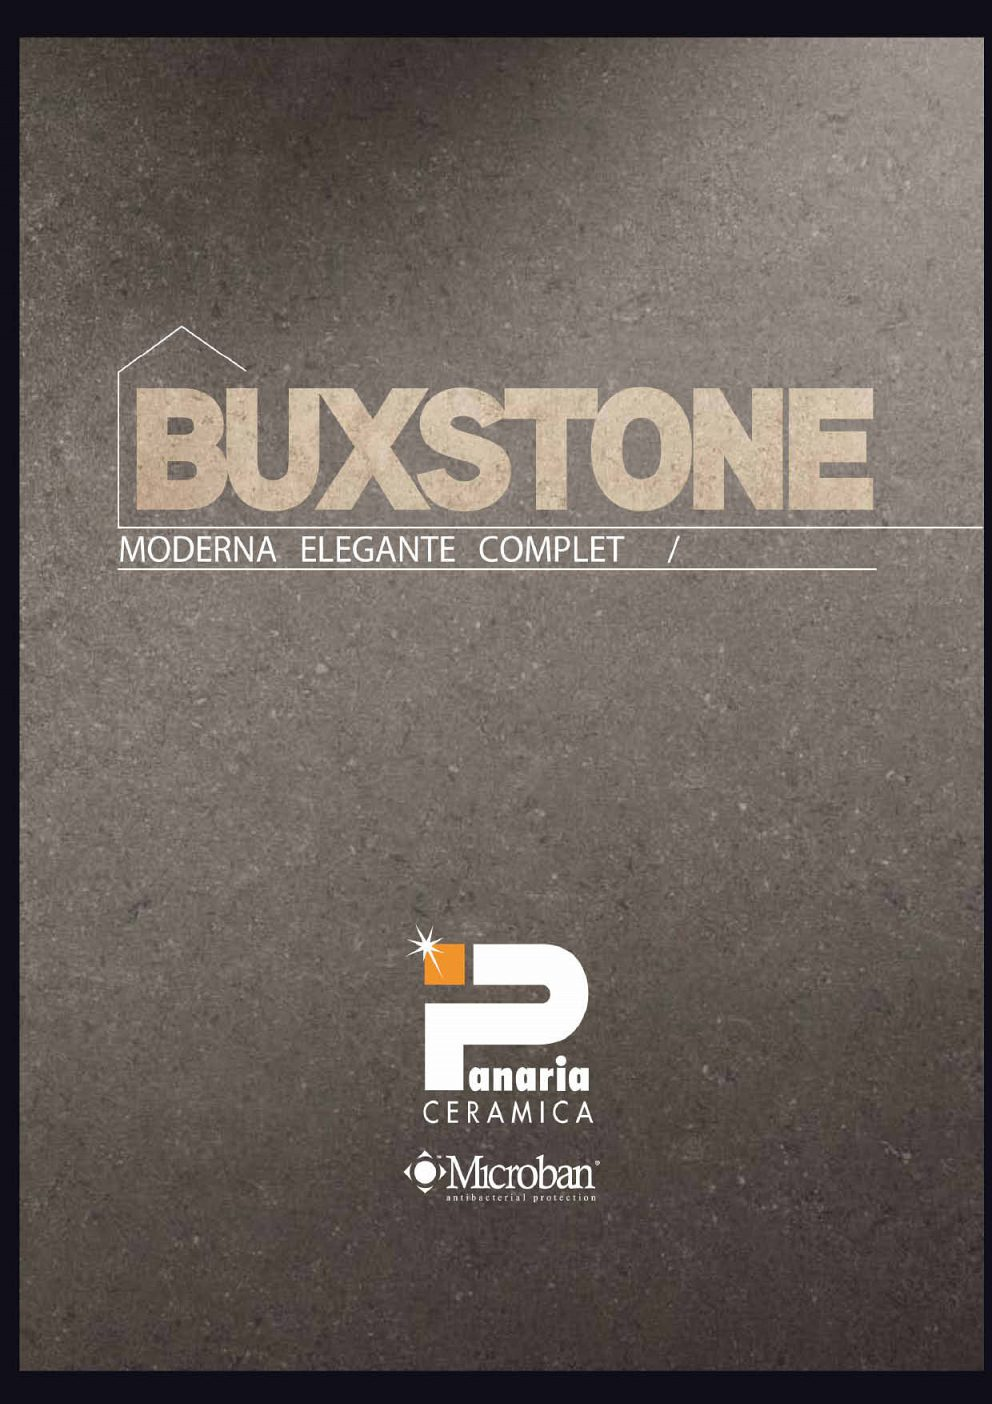 Panaria - Buxstone